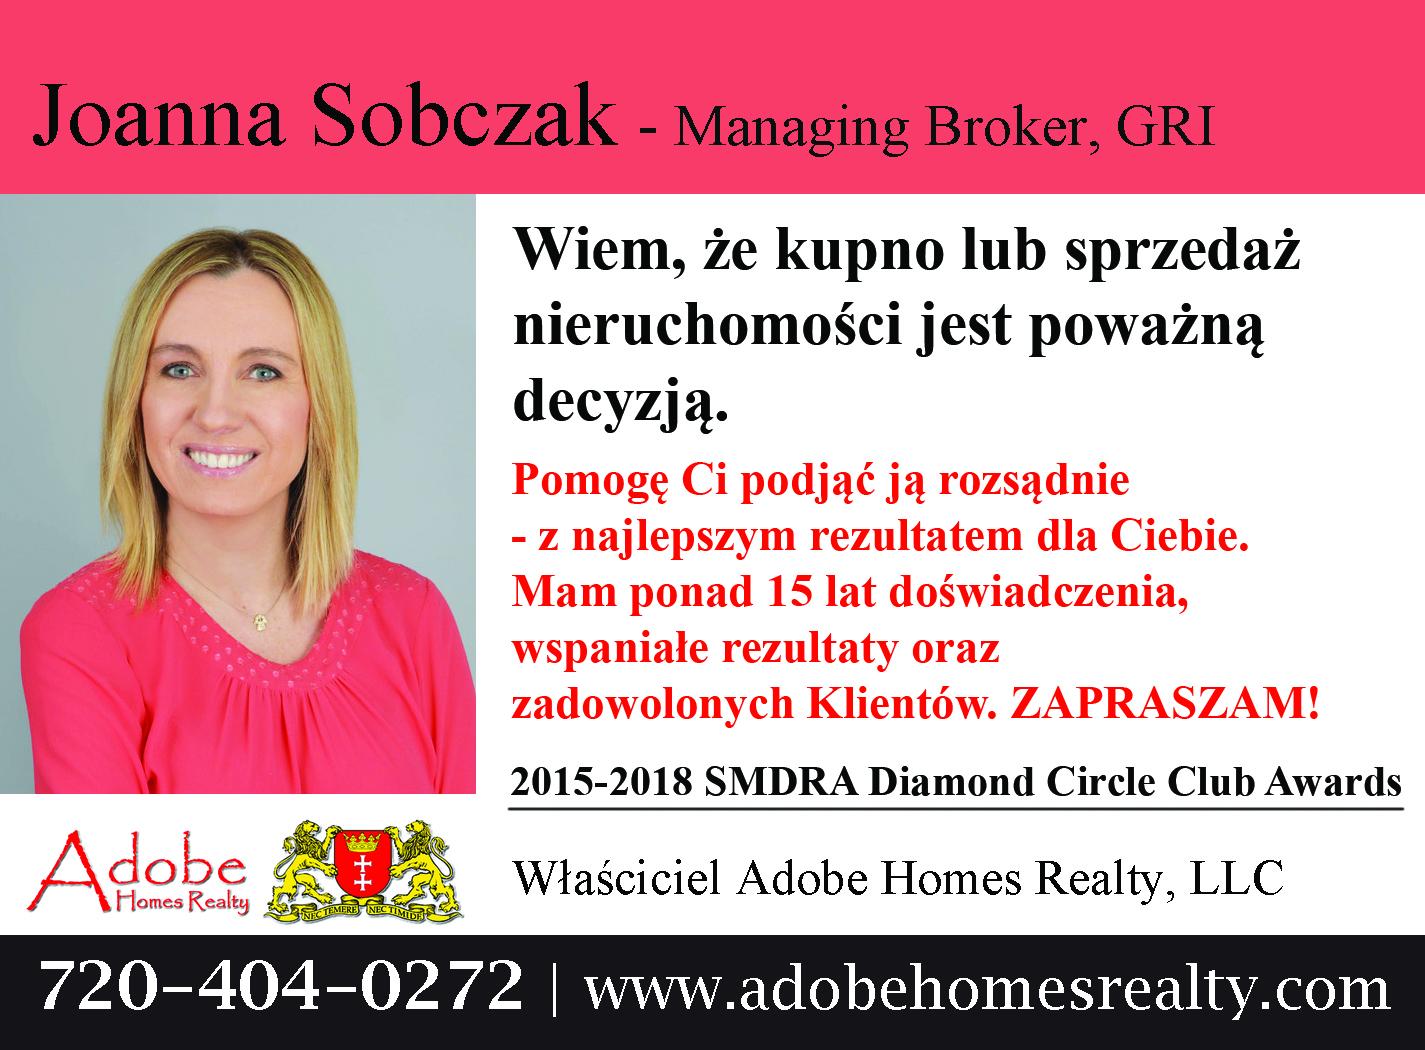 Jonna Sobczak polski broker nieruchomosci w Denver.jpg